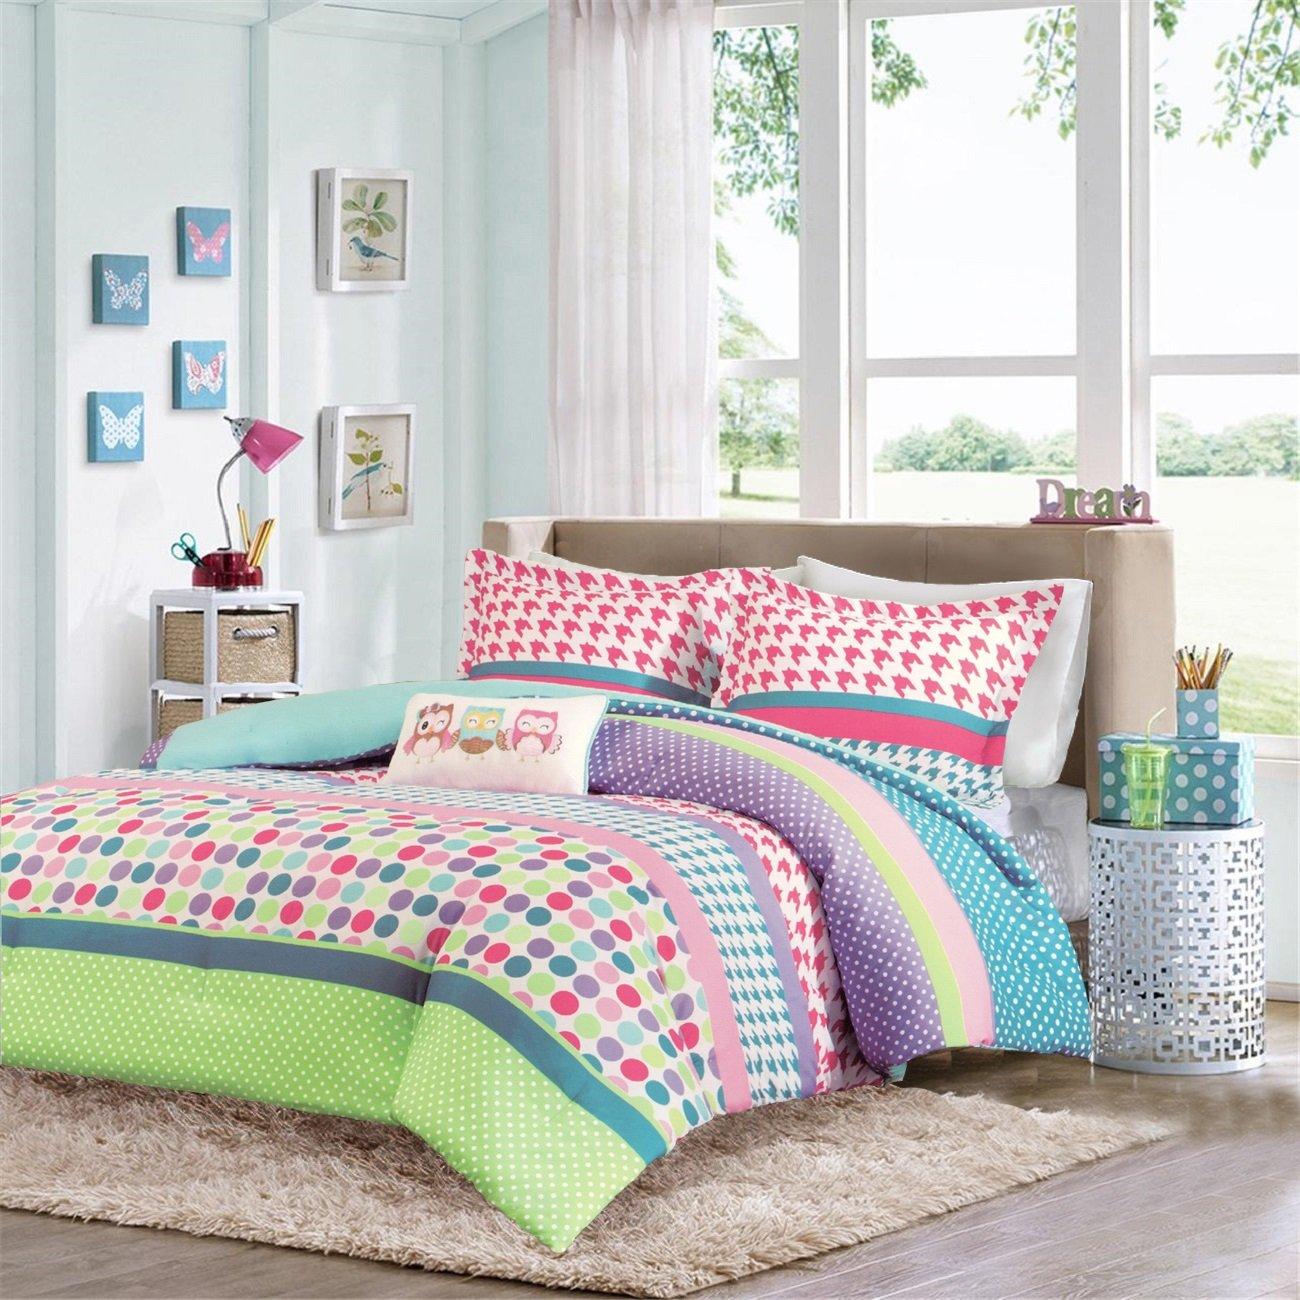 Girls Teen Kids Modern Comforter Bedding Set Pink Purple Aqua Blue Polka Dots Stripes Geometric Design with Owl Pillow. Includes Bonus Sleep Mask From Designer Home. (Full/Queen)